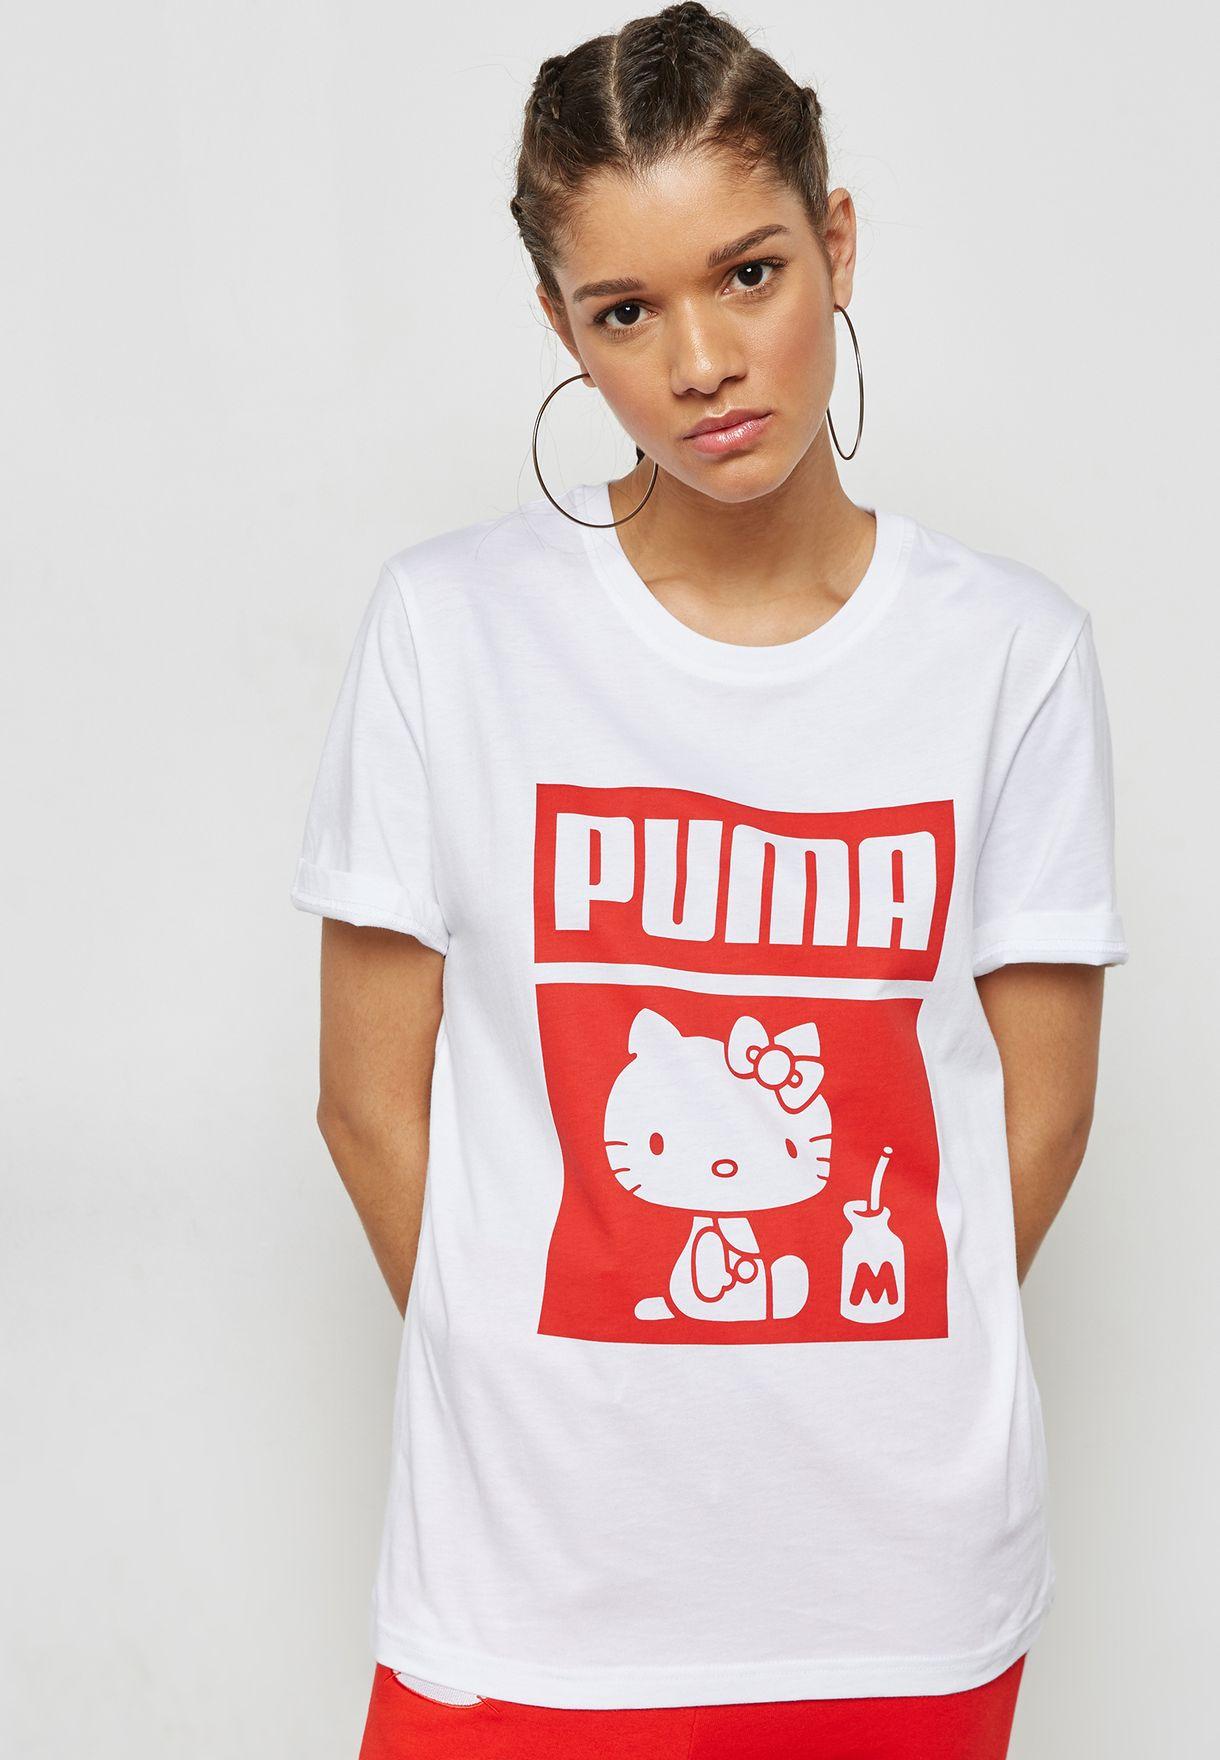 084ec6622 Shop PUMA white Hello Kitty T-Shirt 57673002 for Women in UAE ...